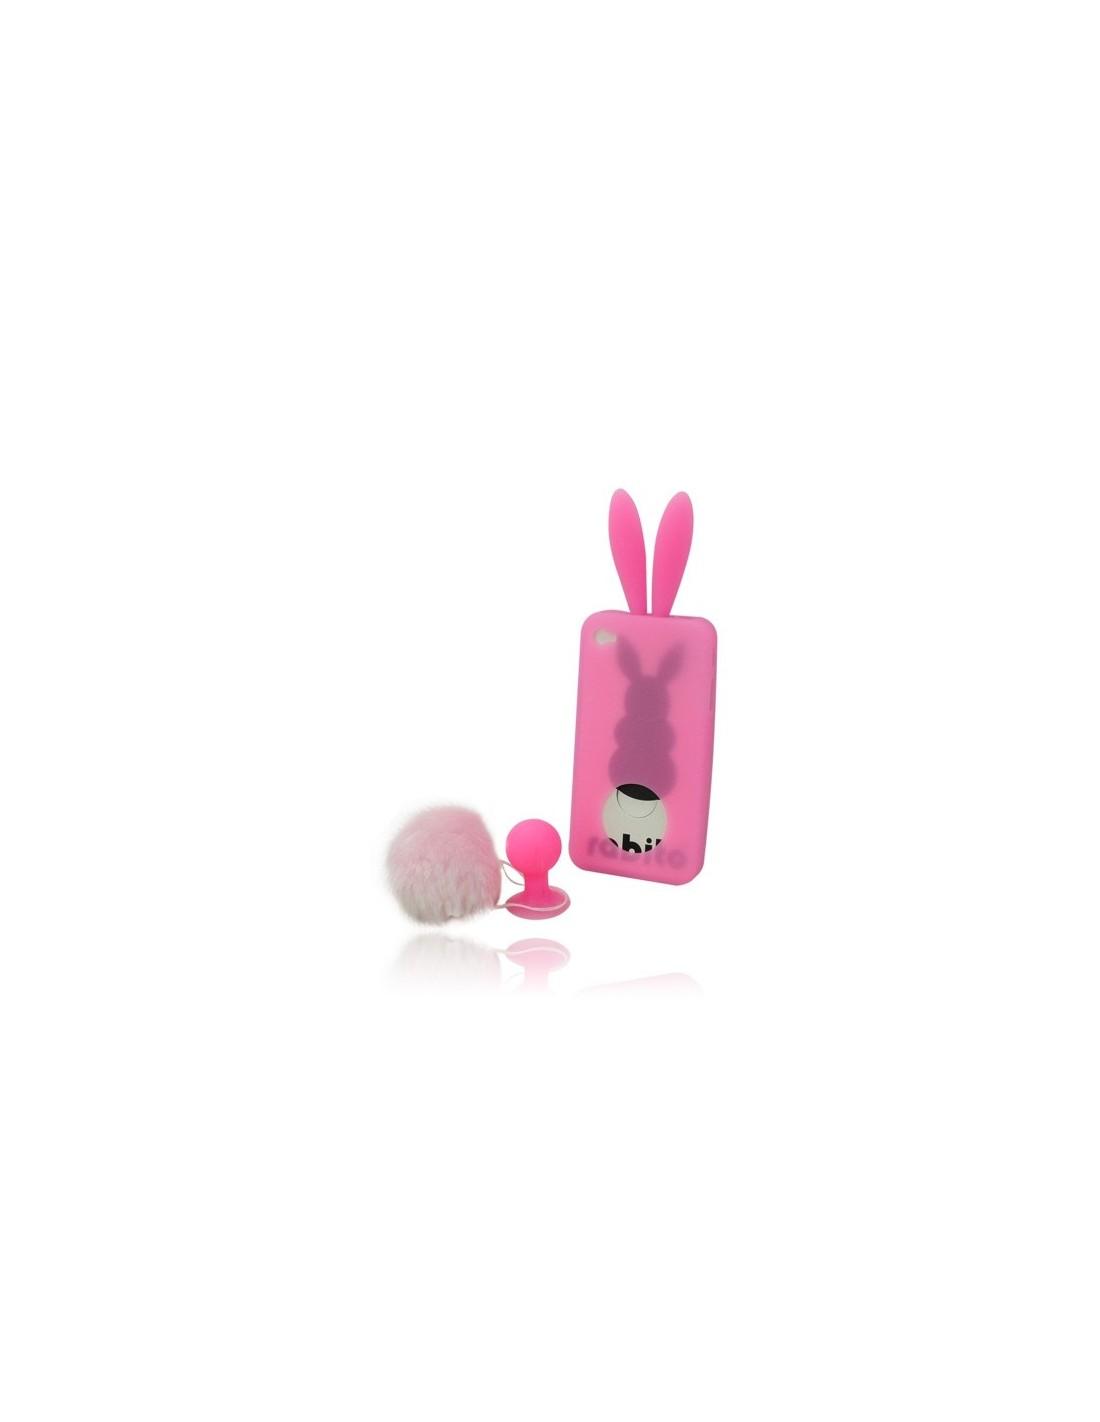 coque lapin rabbit en silicone pour iphone 4 4s coques. Black Bedroom Furniture Sets. Home Design Ideas